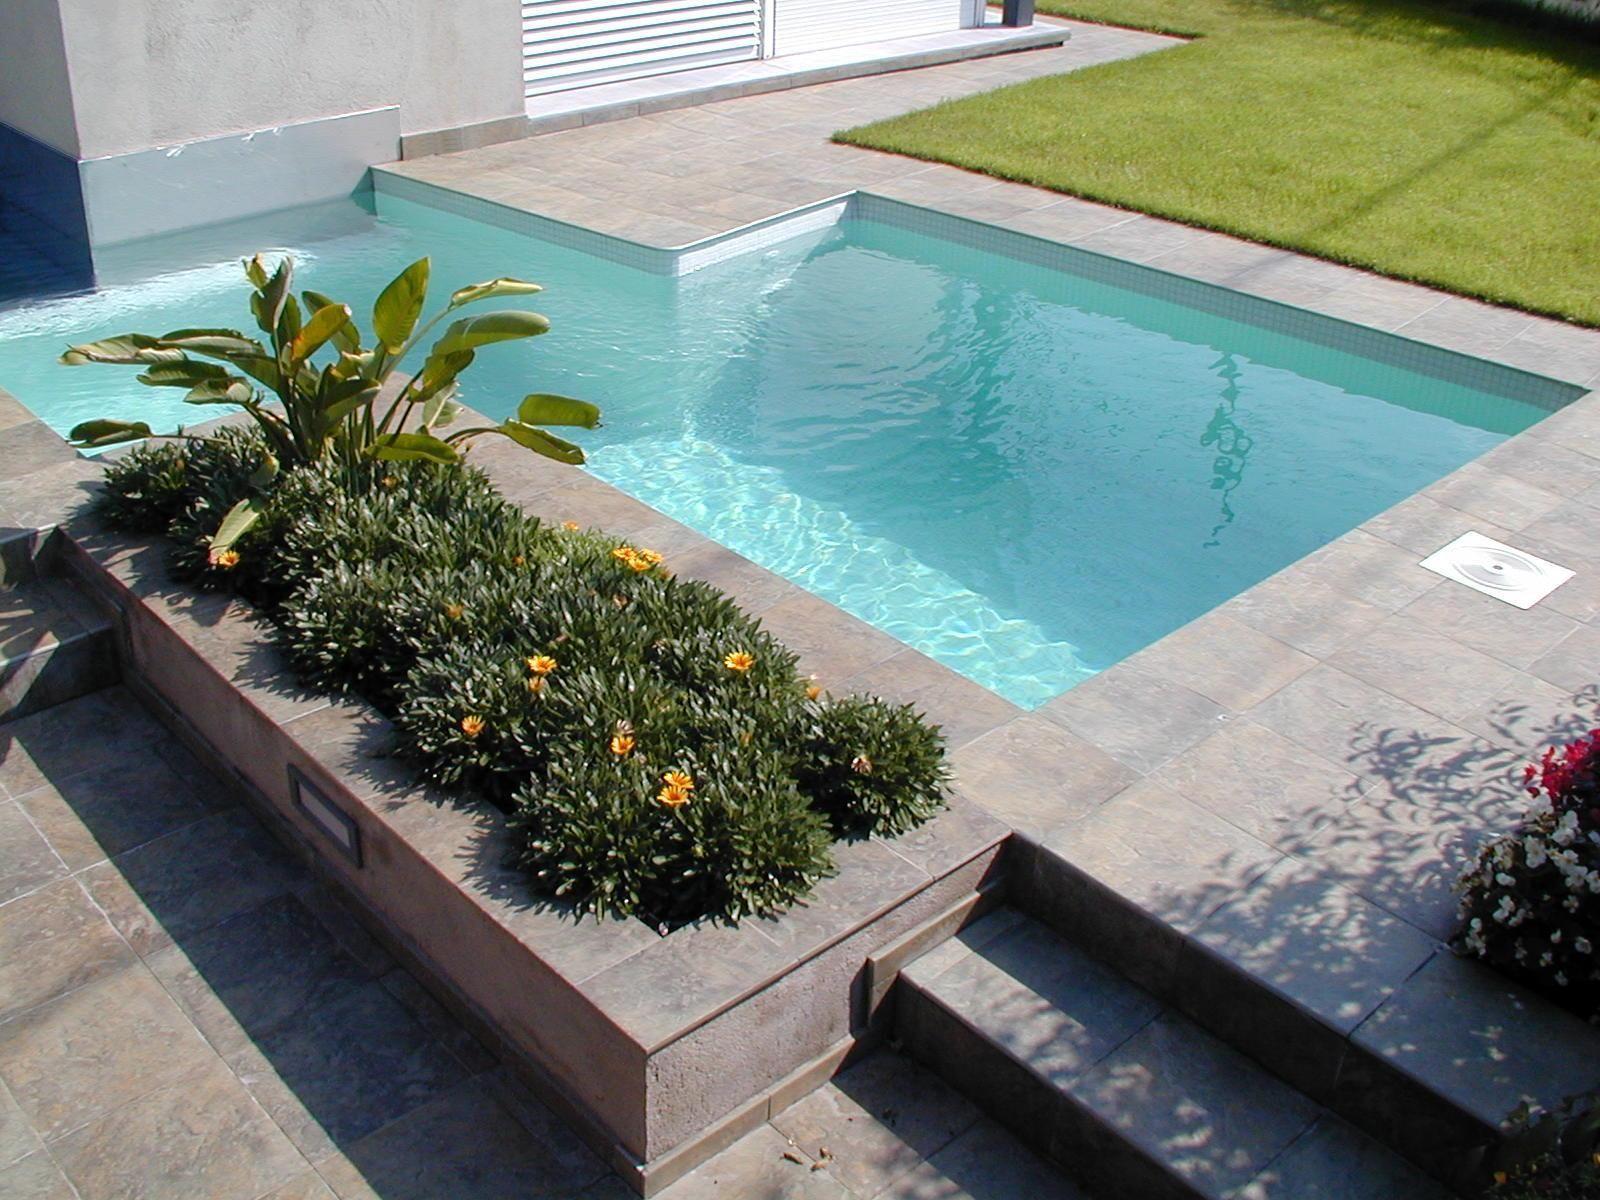 M s de 25 ideas incre bles sobre piscinas gre en pinterest for Depuradoras para piscinas desmontables carrefour